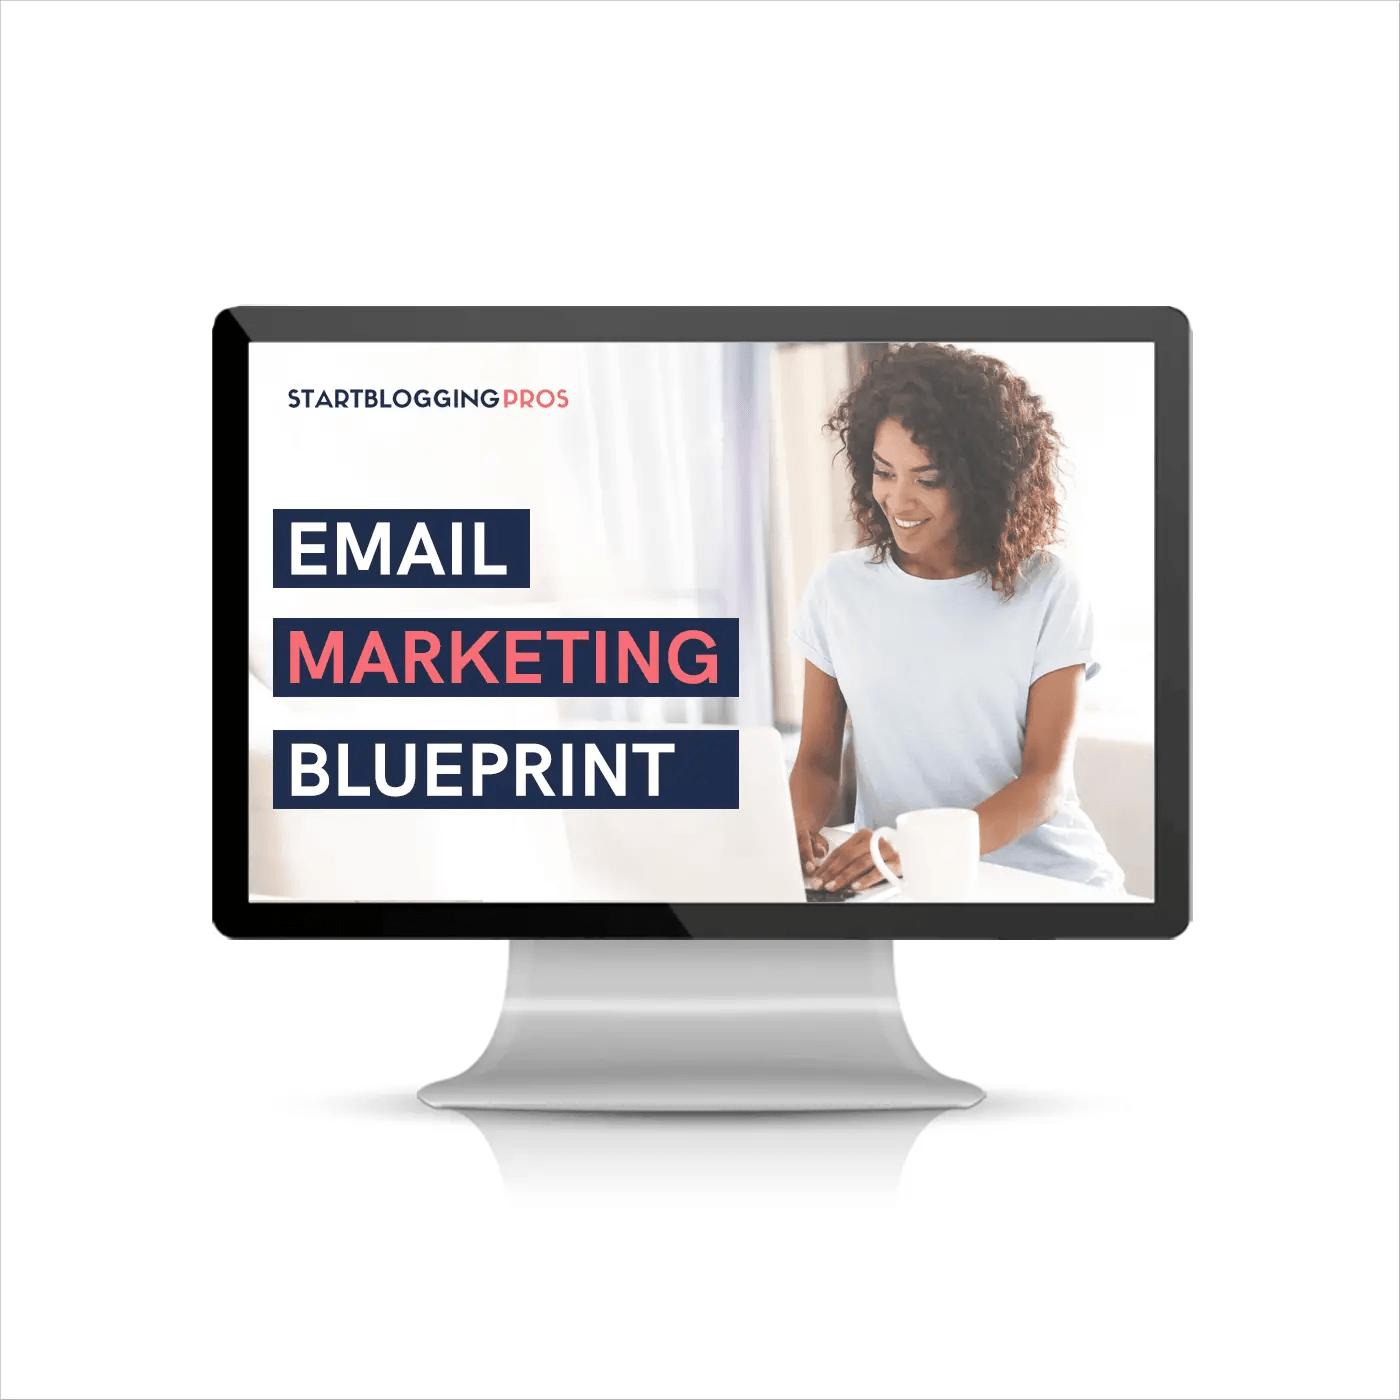 email marketing course list building course startbloggingpros.com